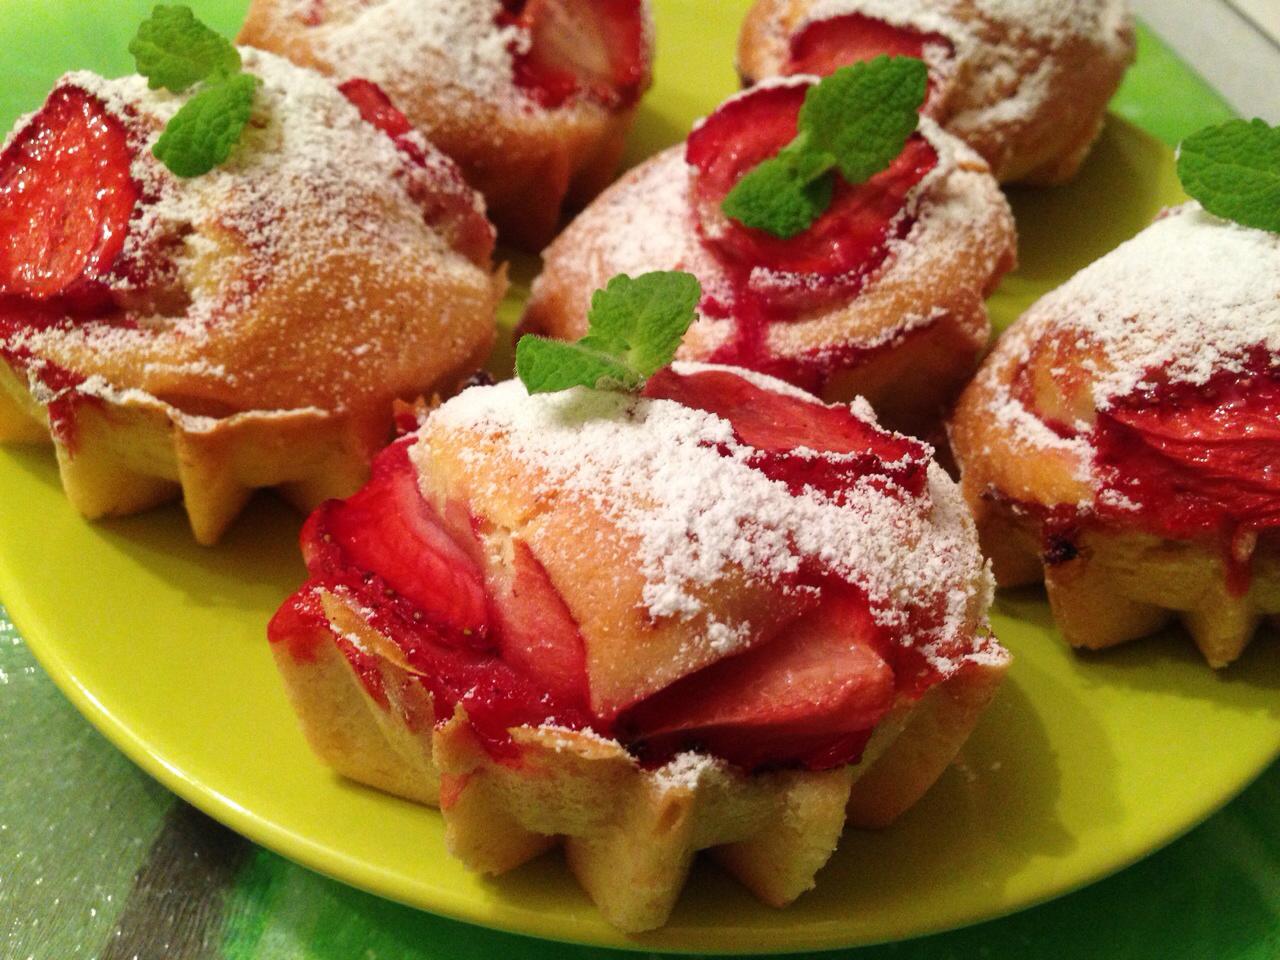 cupcakes con fresas, mufins con fresas